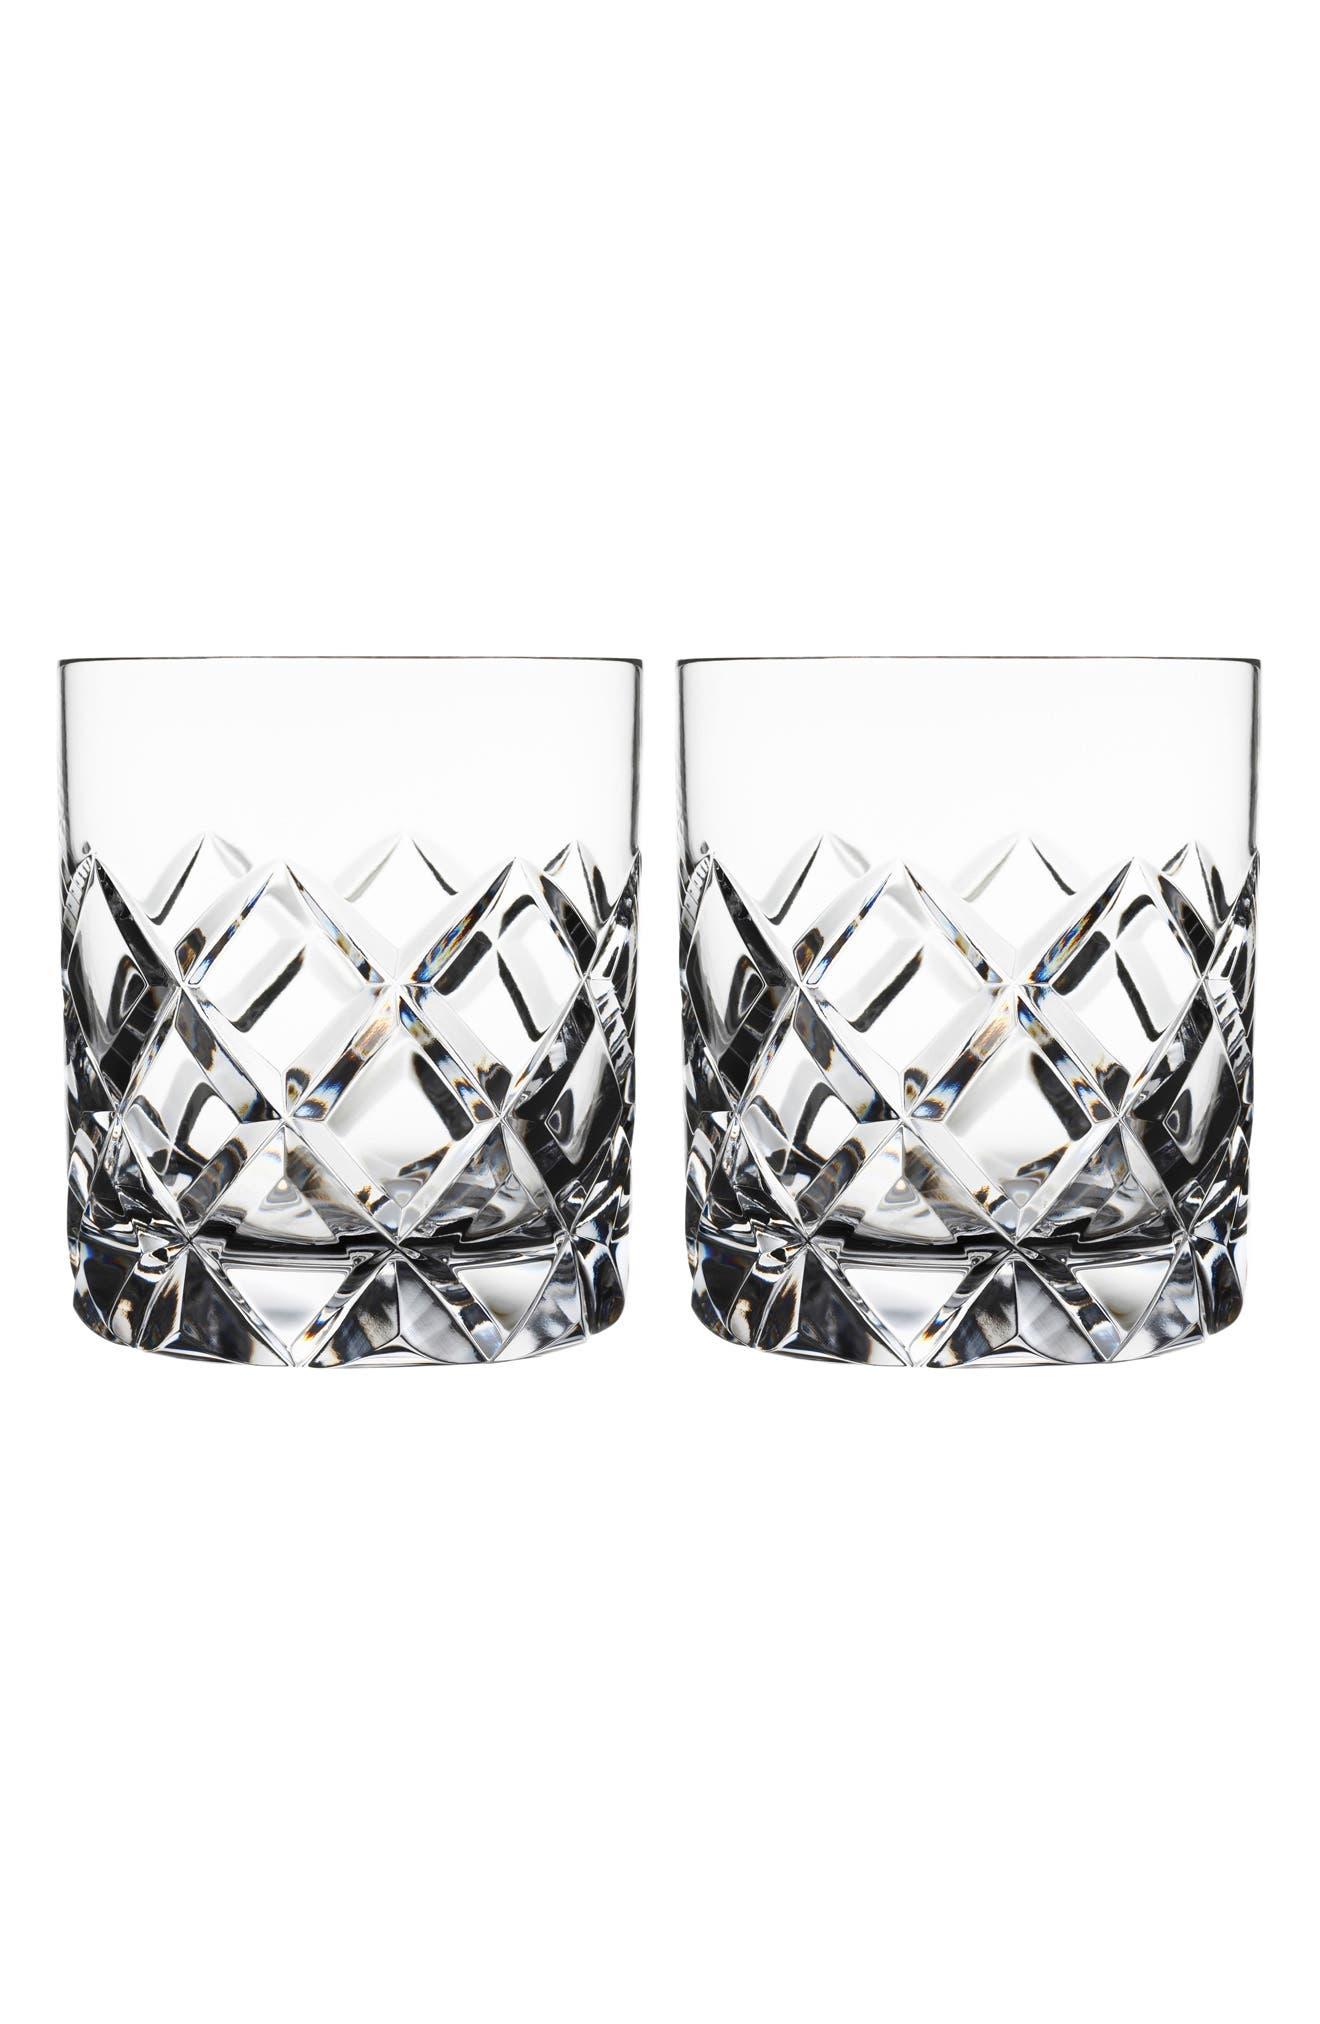 Alternate Image 1 Selected - Orrefors Sofiero Set of 2 Crystal Old Fashioned Glasses